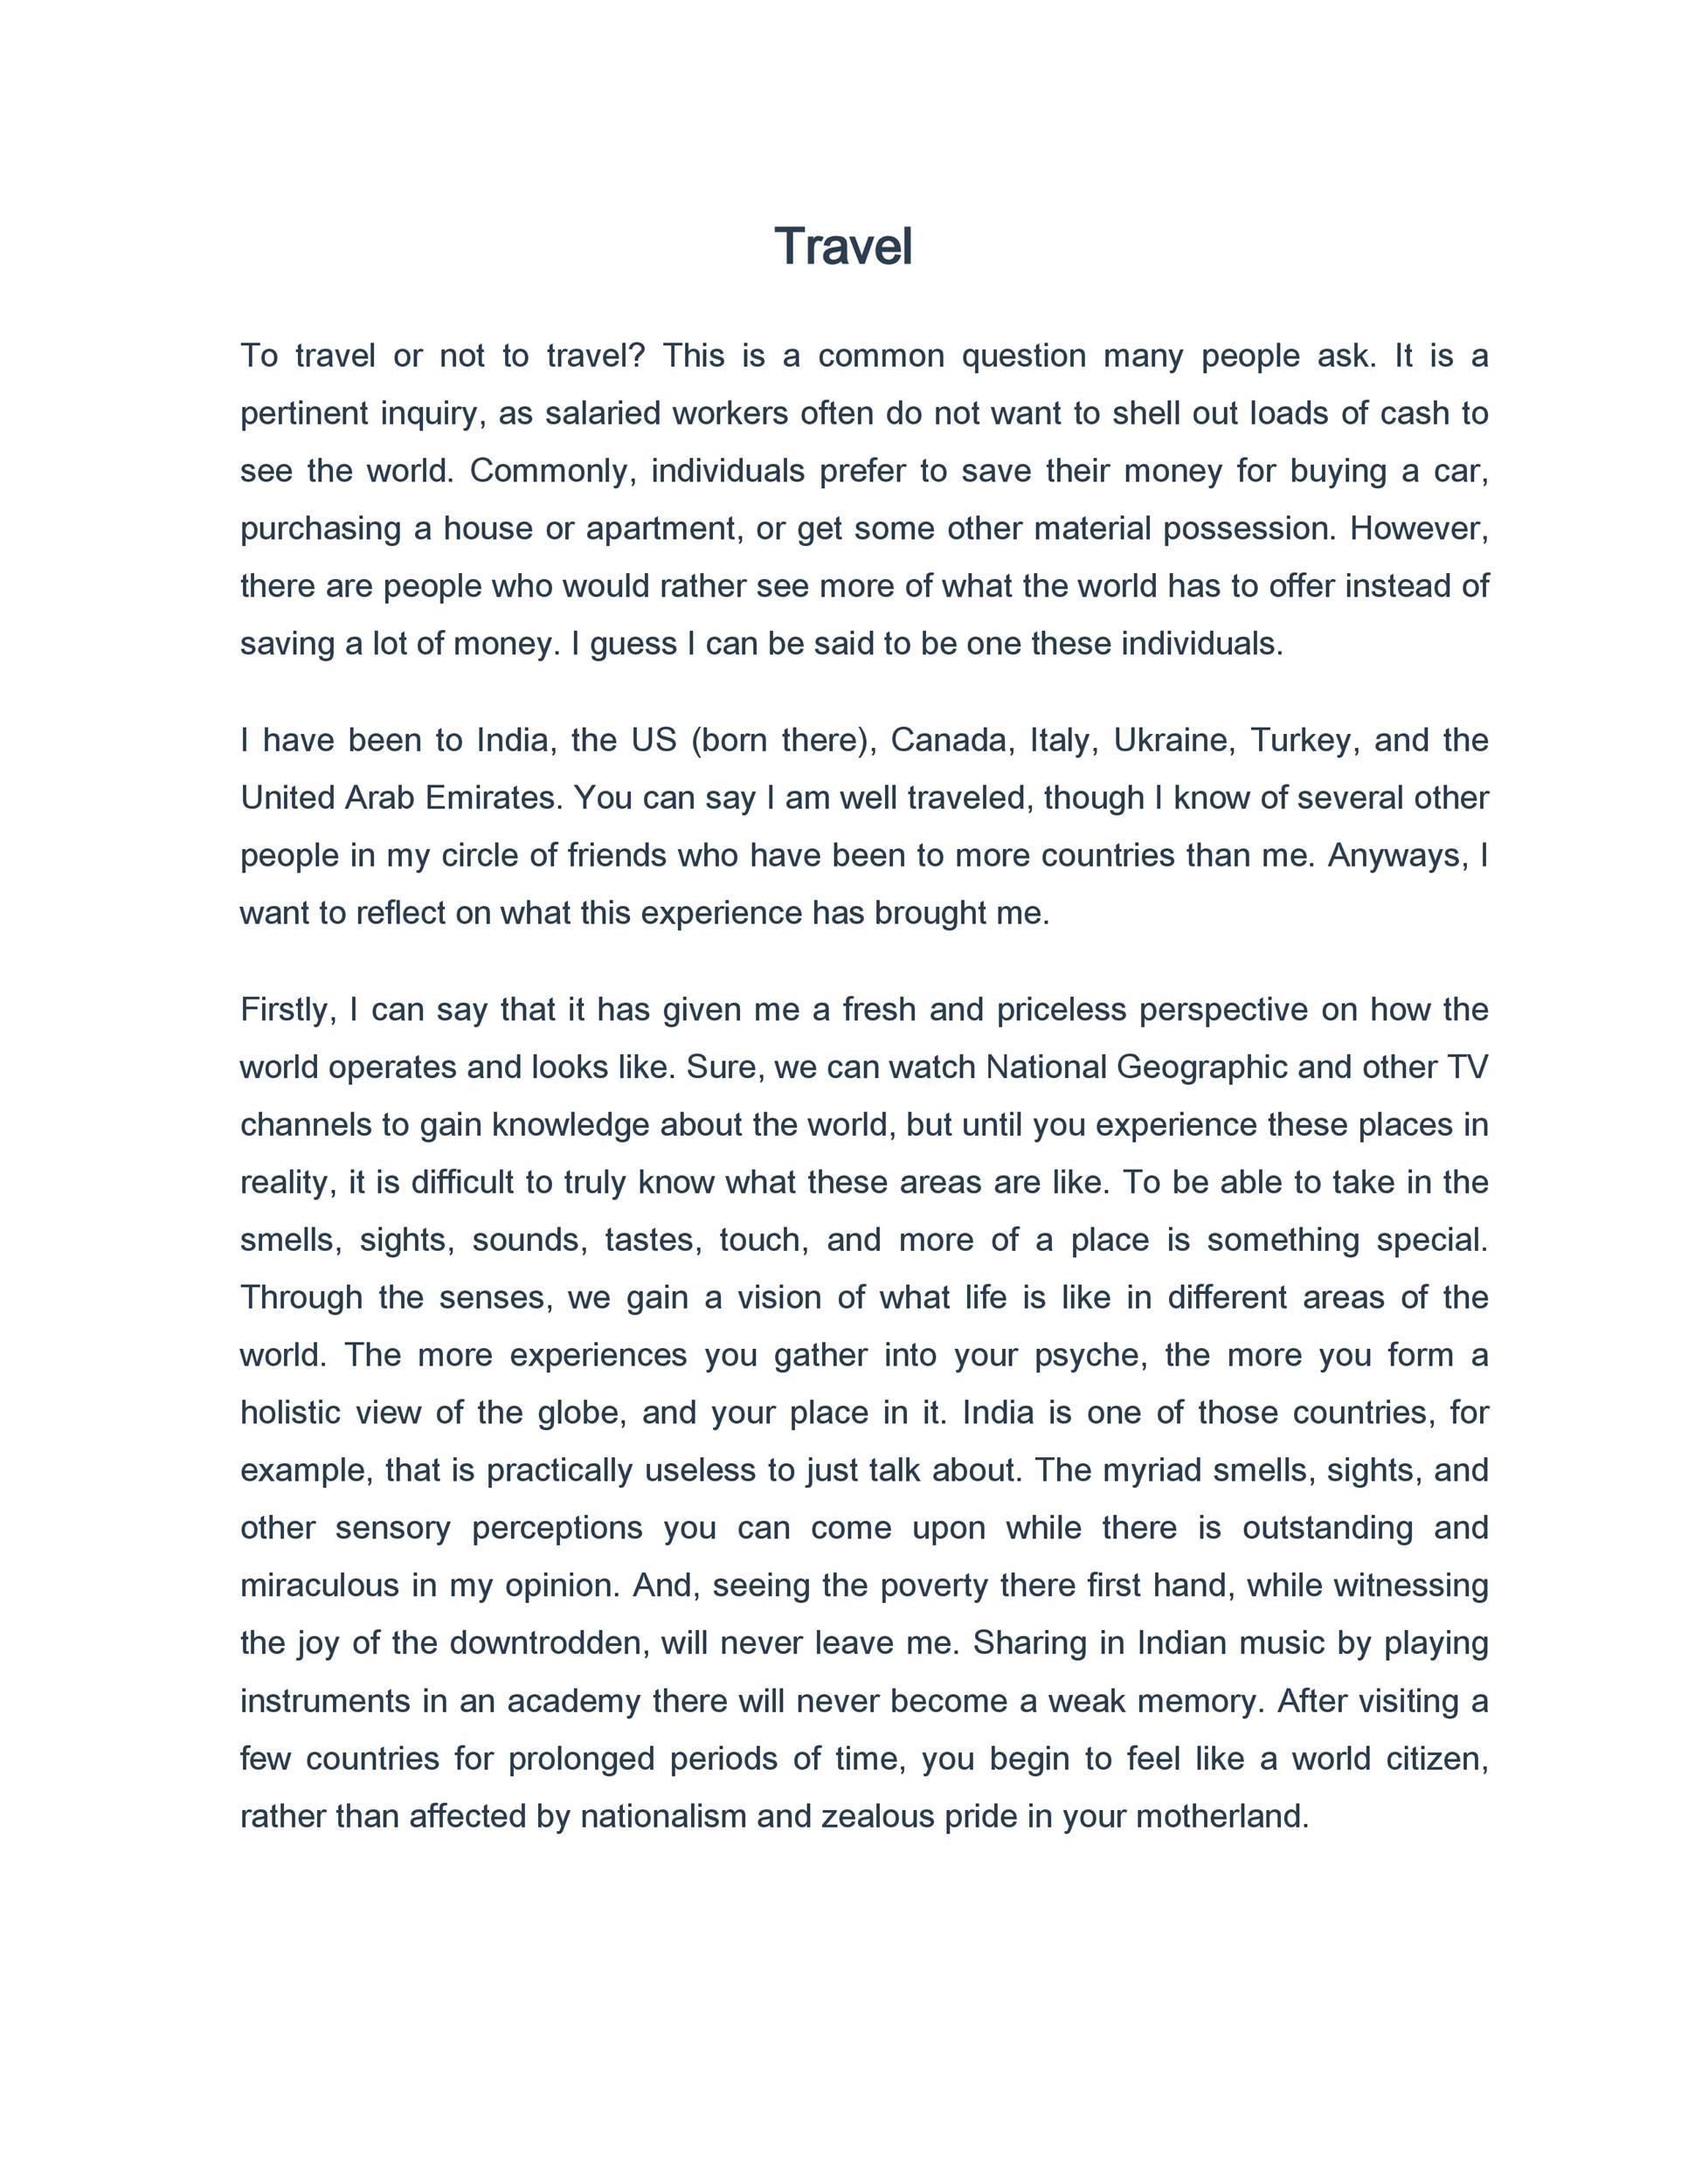 Pierre simon laplace a philosophical essay on probabilities